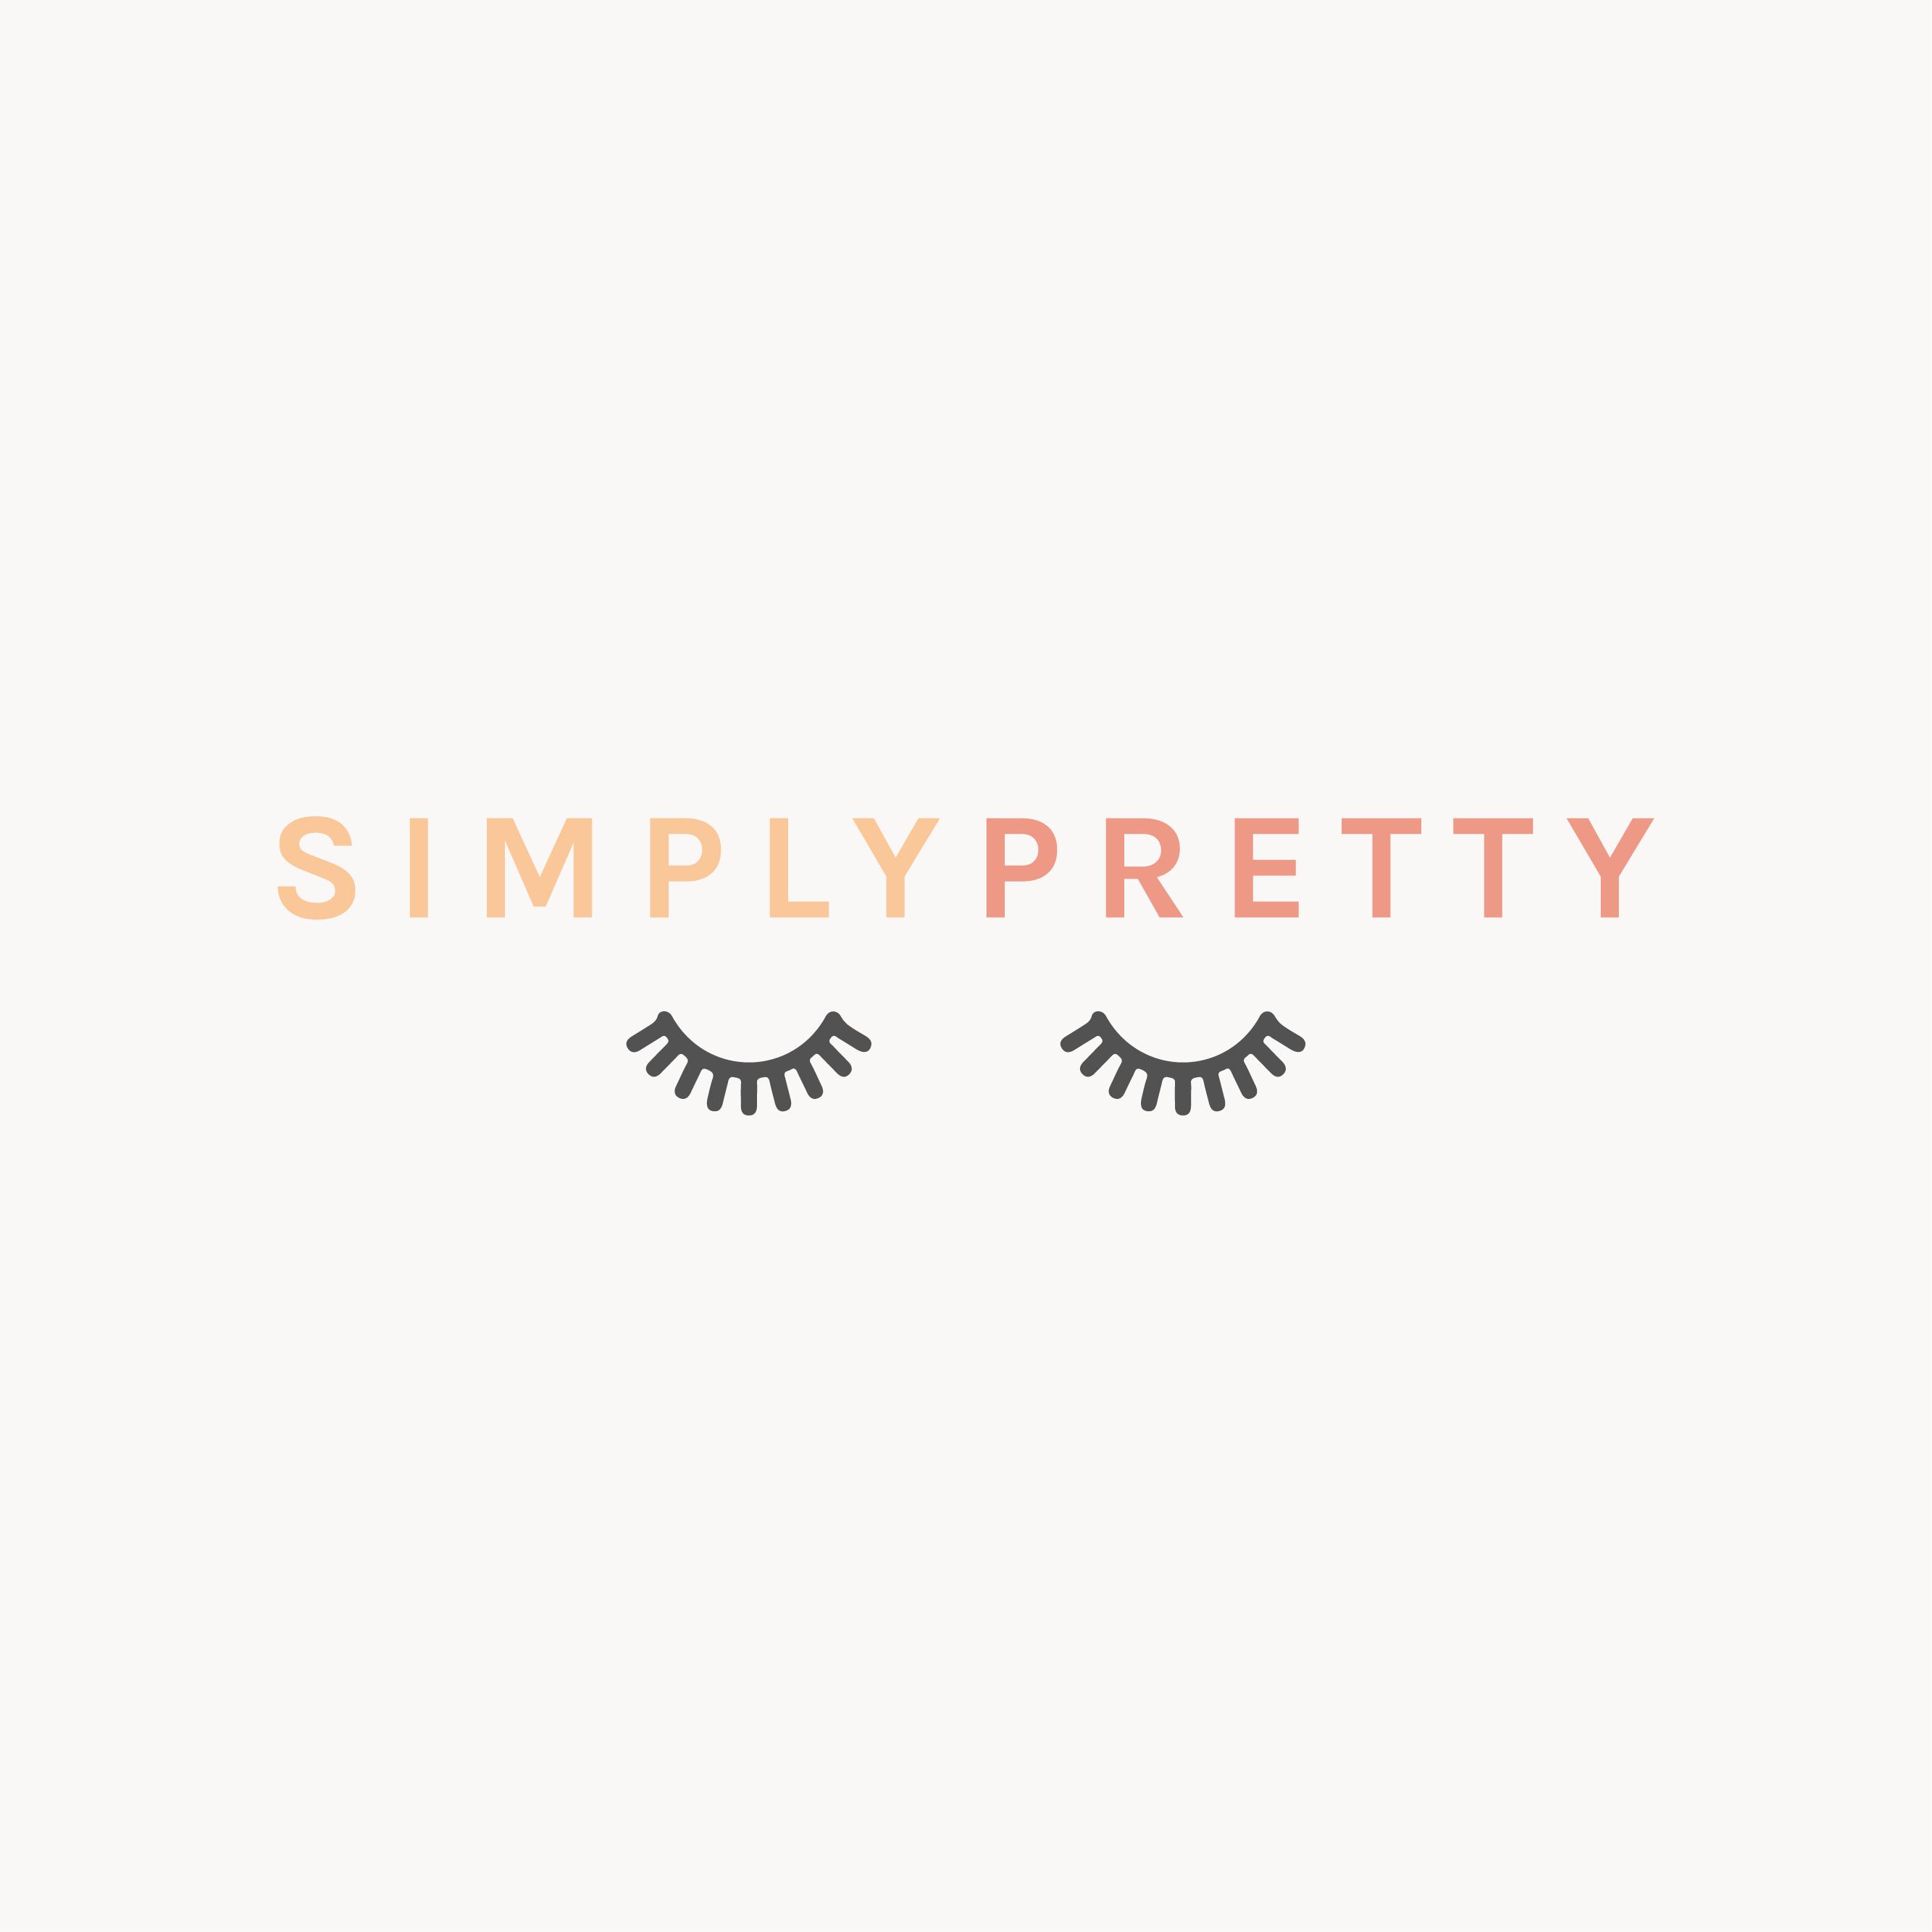 Simply Pretty Artistry Makeup Artist Logo Designed By Amari Creative Amaricreative Logo Branding Design Studio Creative Branding Makeup Artist Logo Design